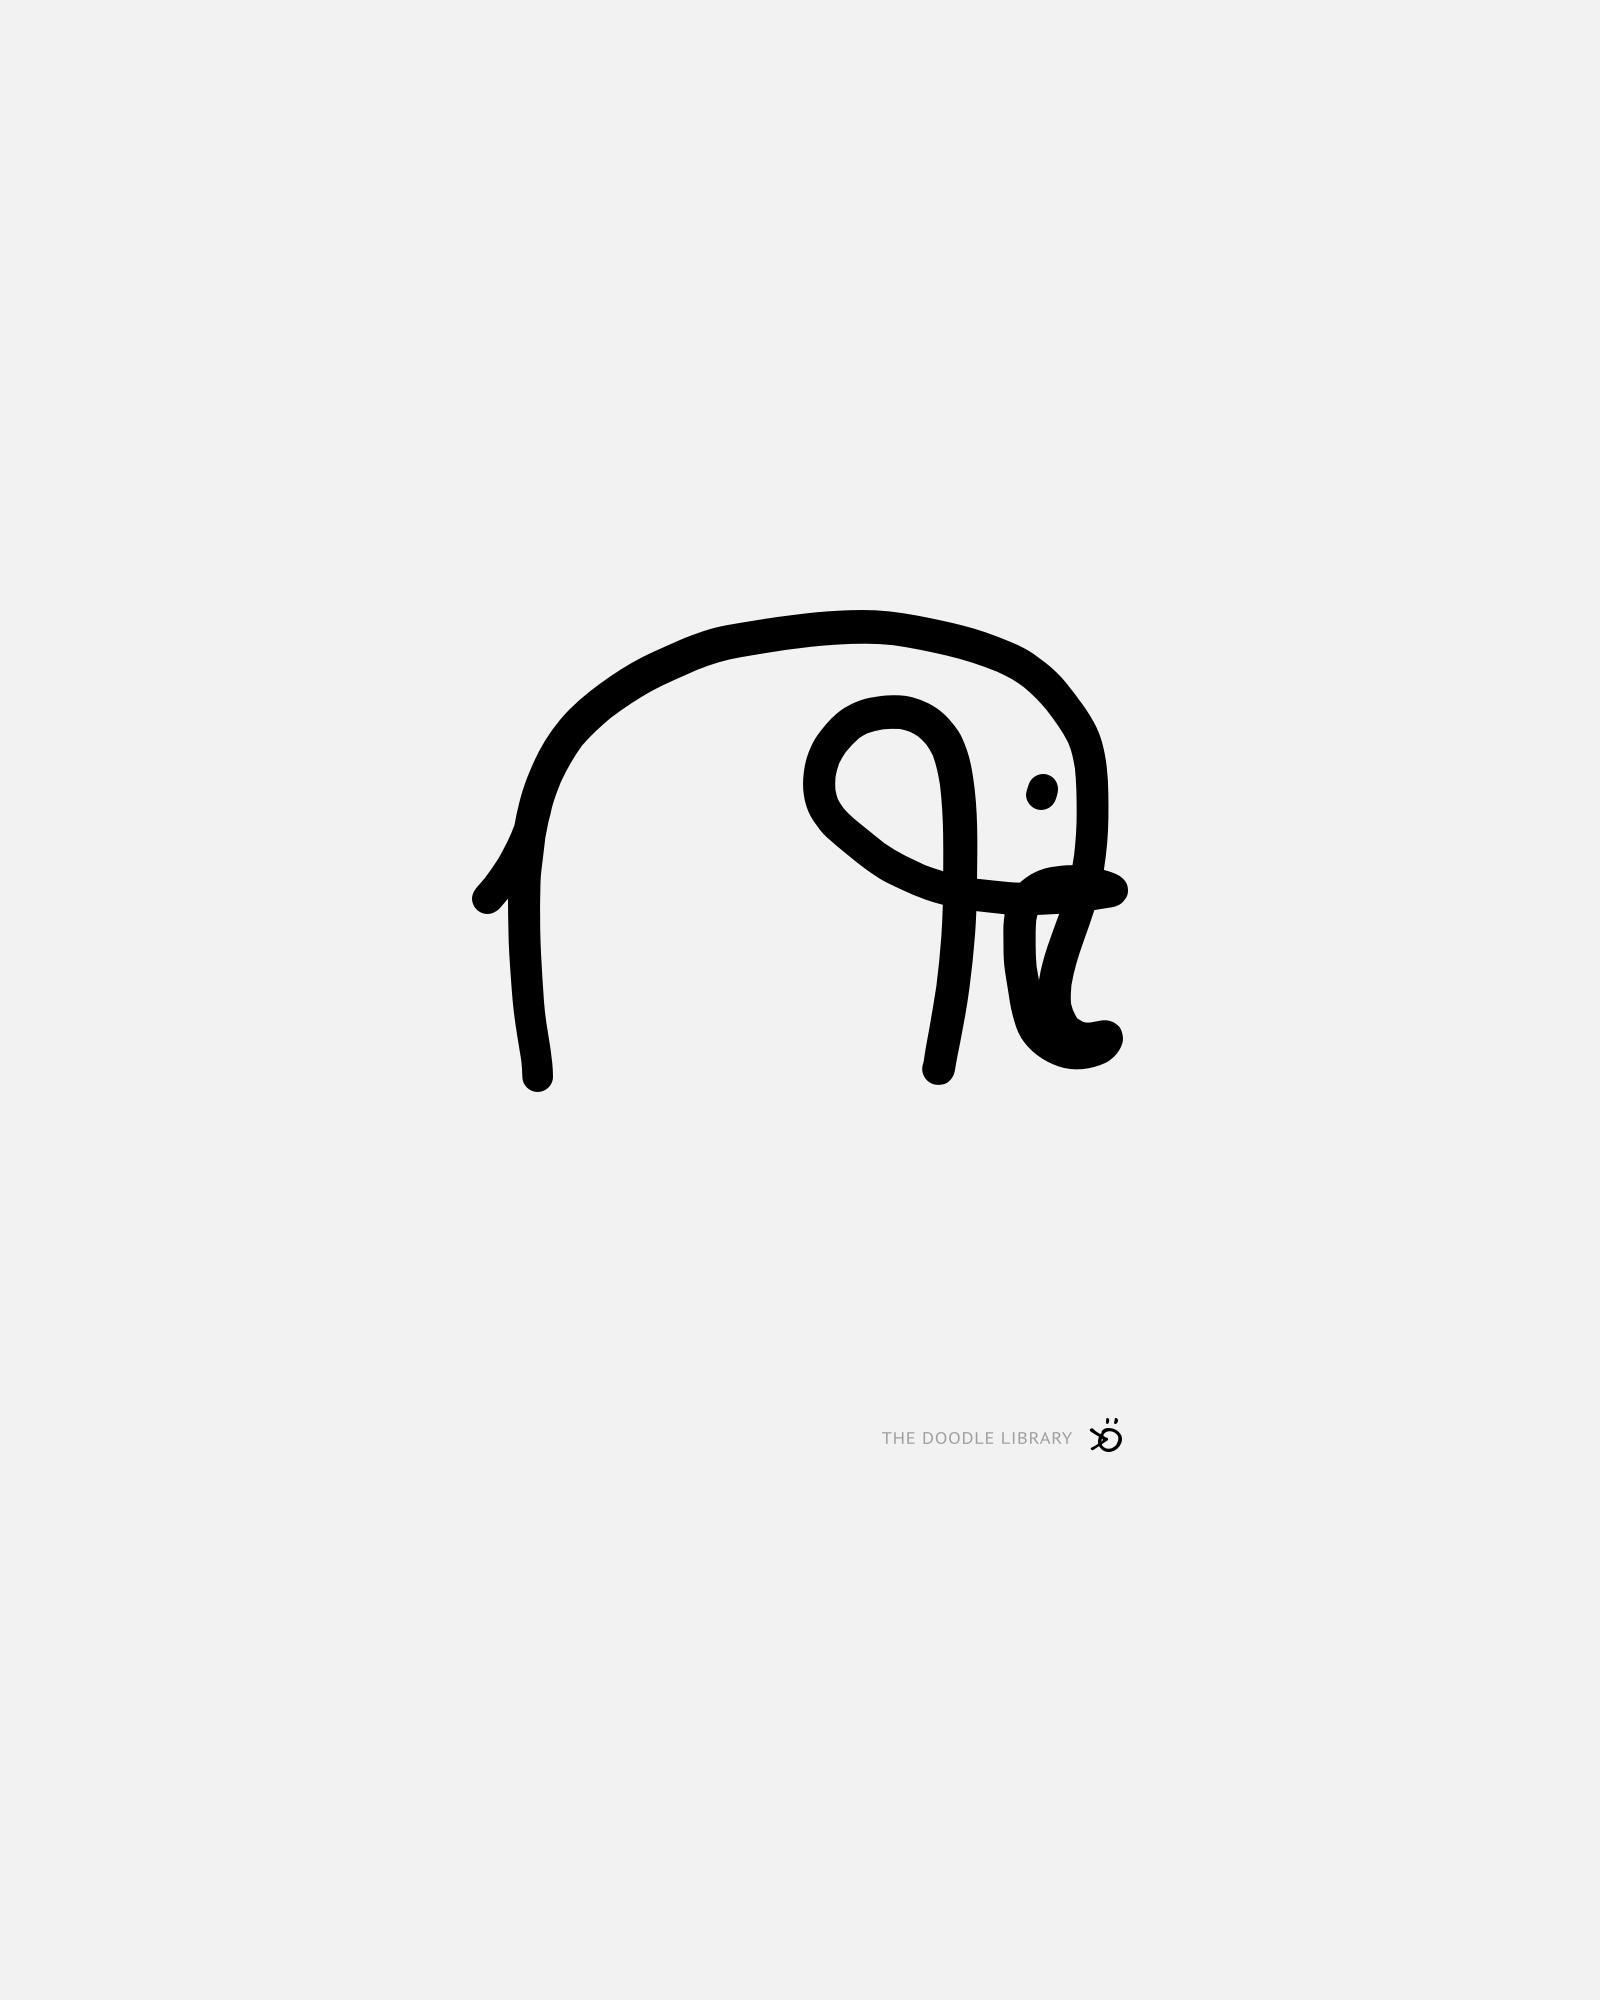 Minimalist Elephant Drawing: Elephant Simple Drawing Doodle